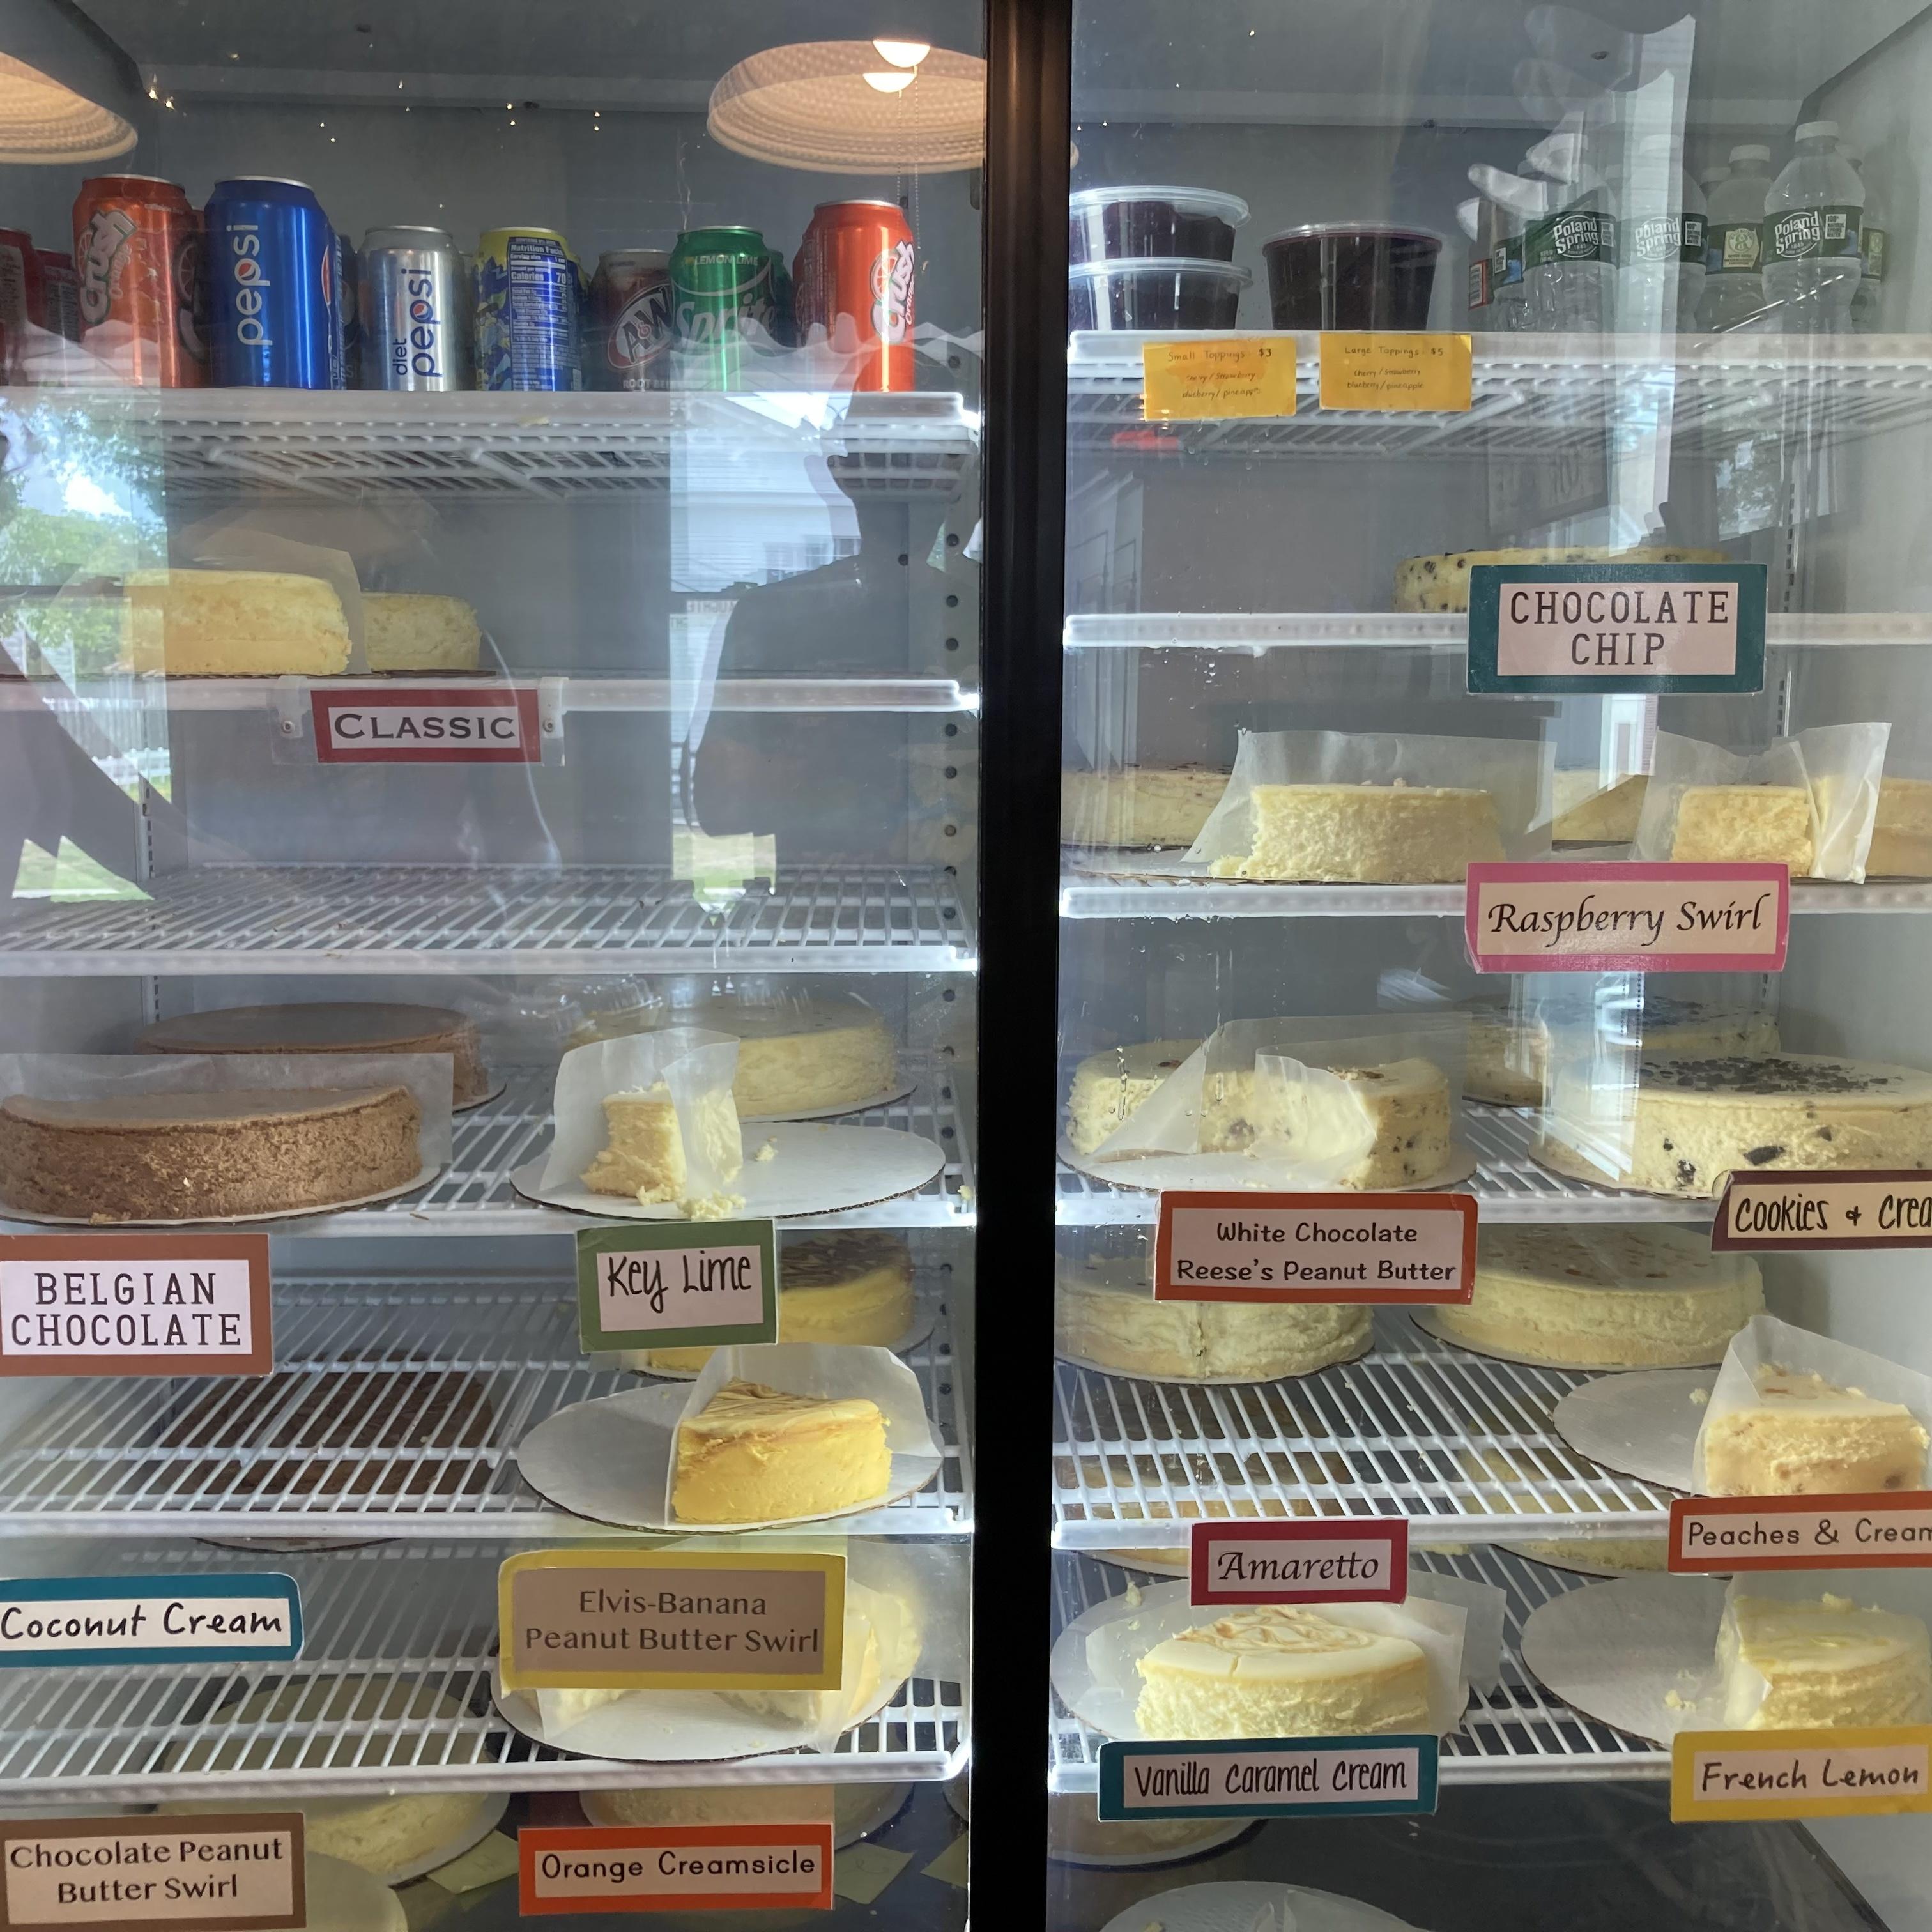 Refrigerator full of cheesecakes.